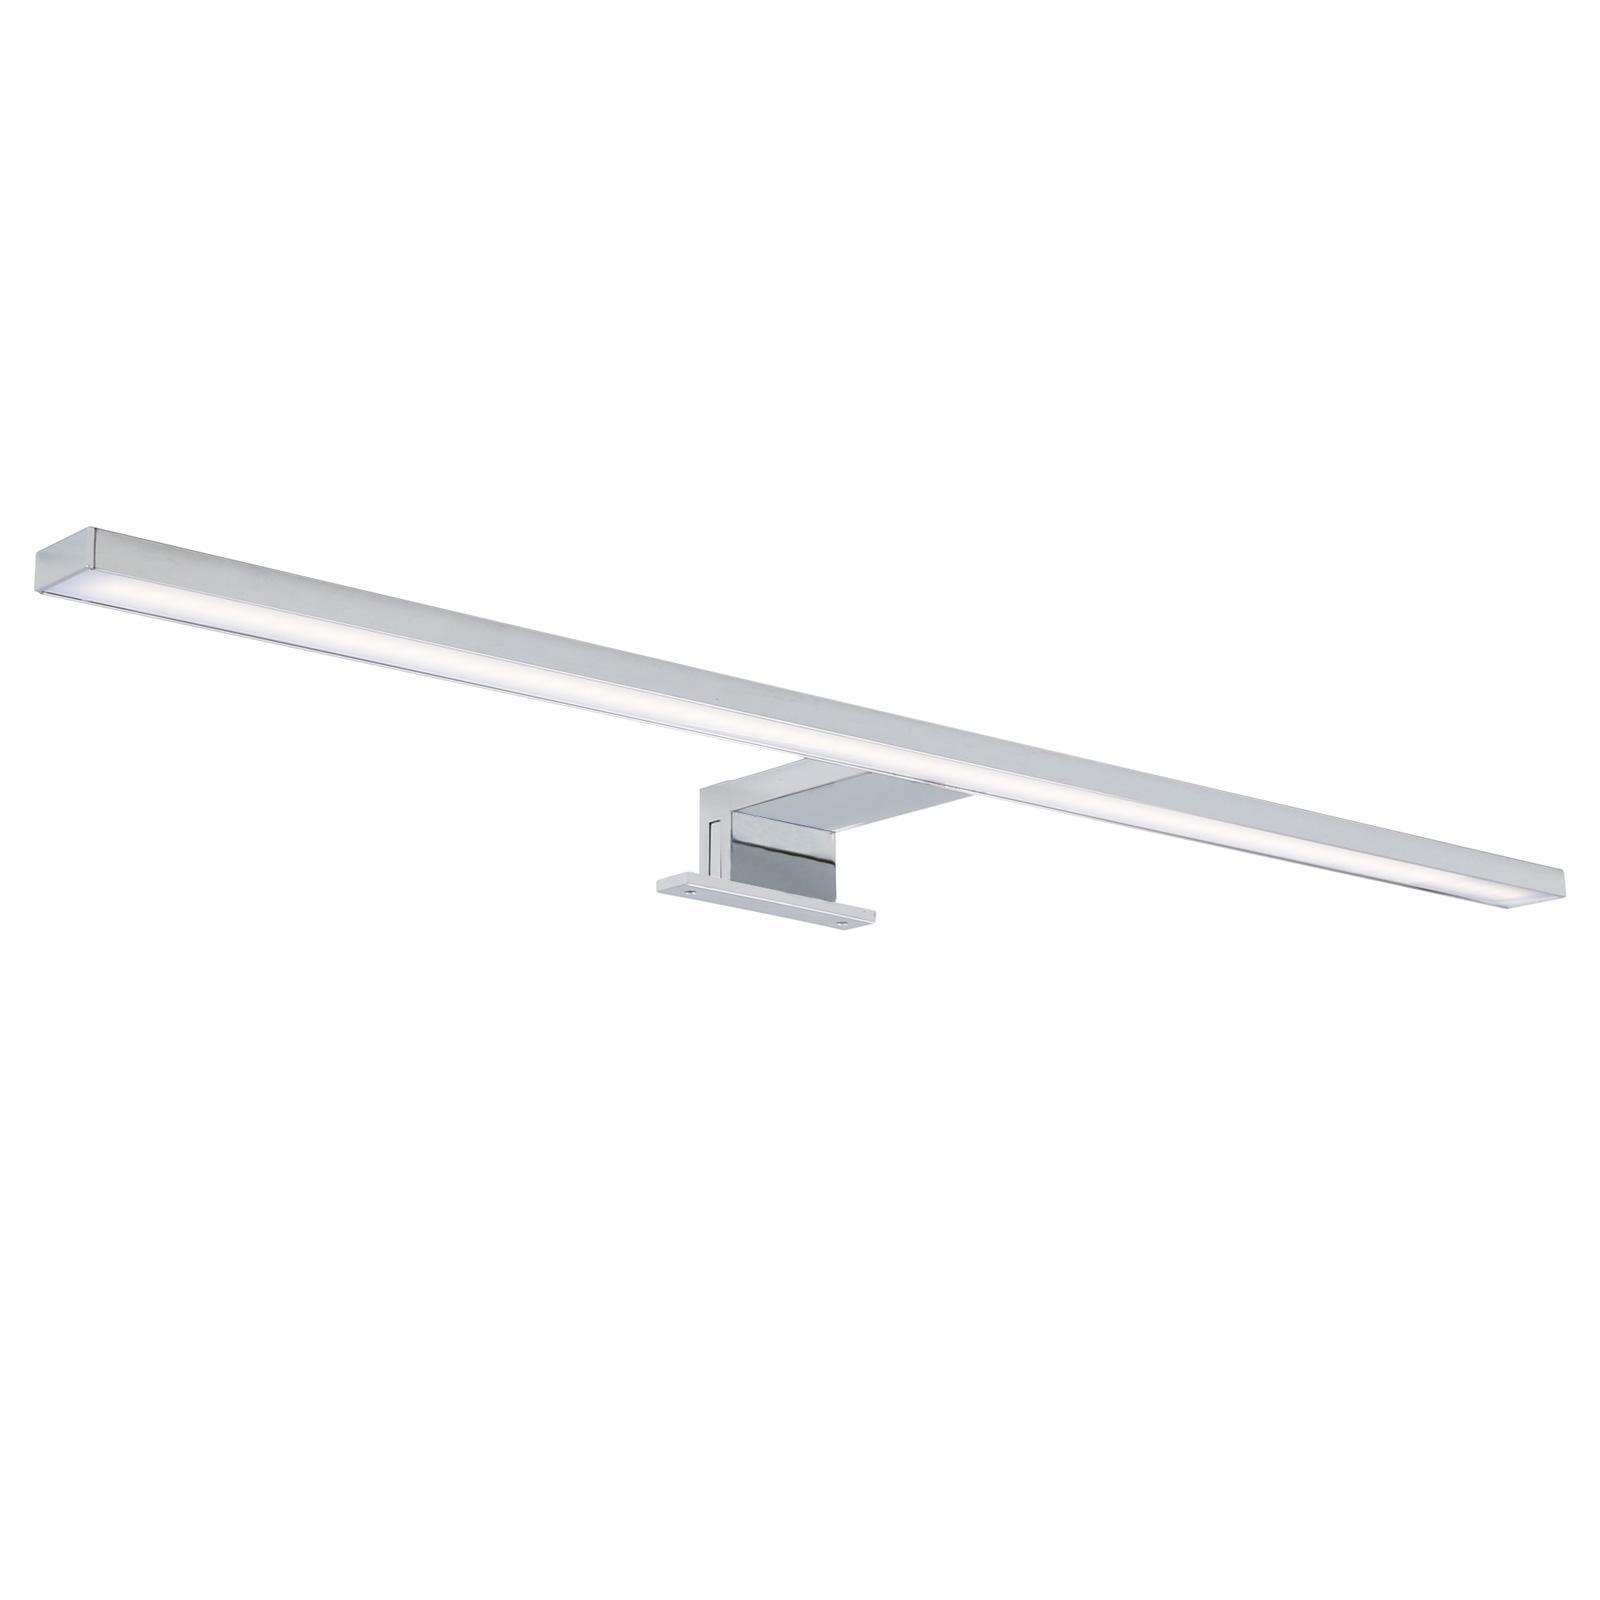 LED-peilivalaisin 2104, 60 cm